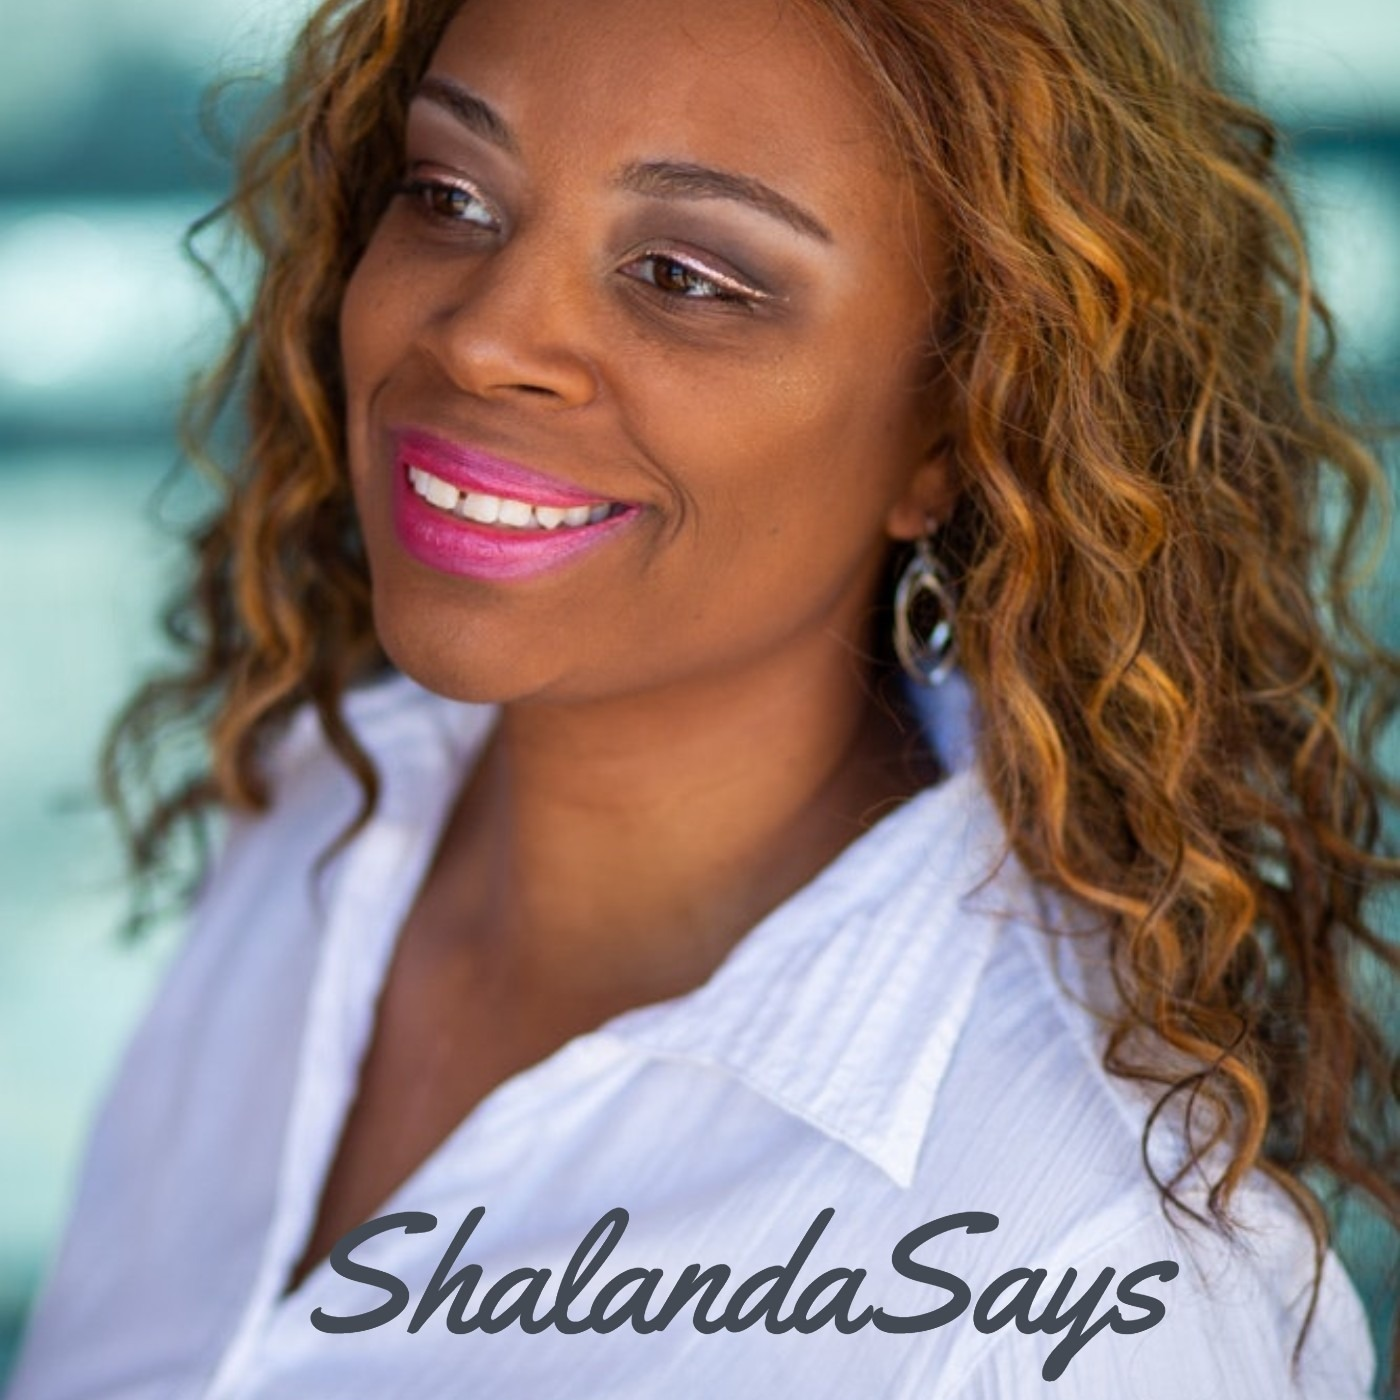 ShalandaSays Meet Clete Bulach